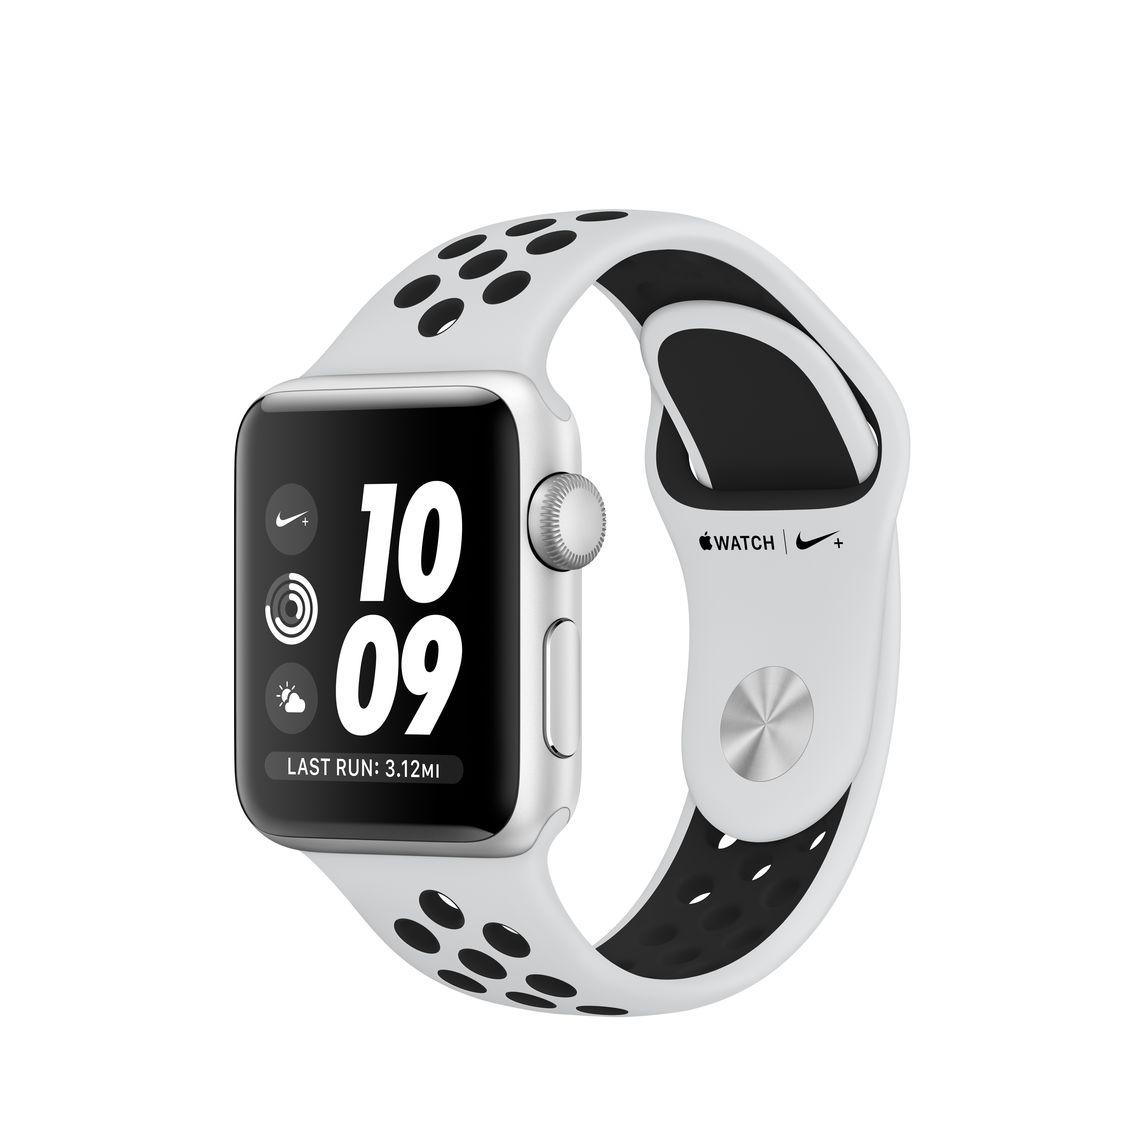 Apple Watch Series 3 Silver 38mm